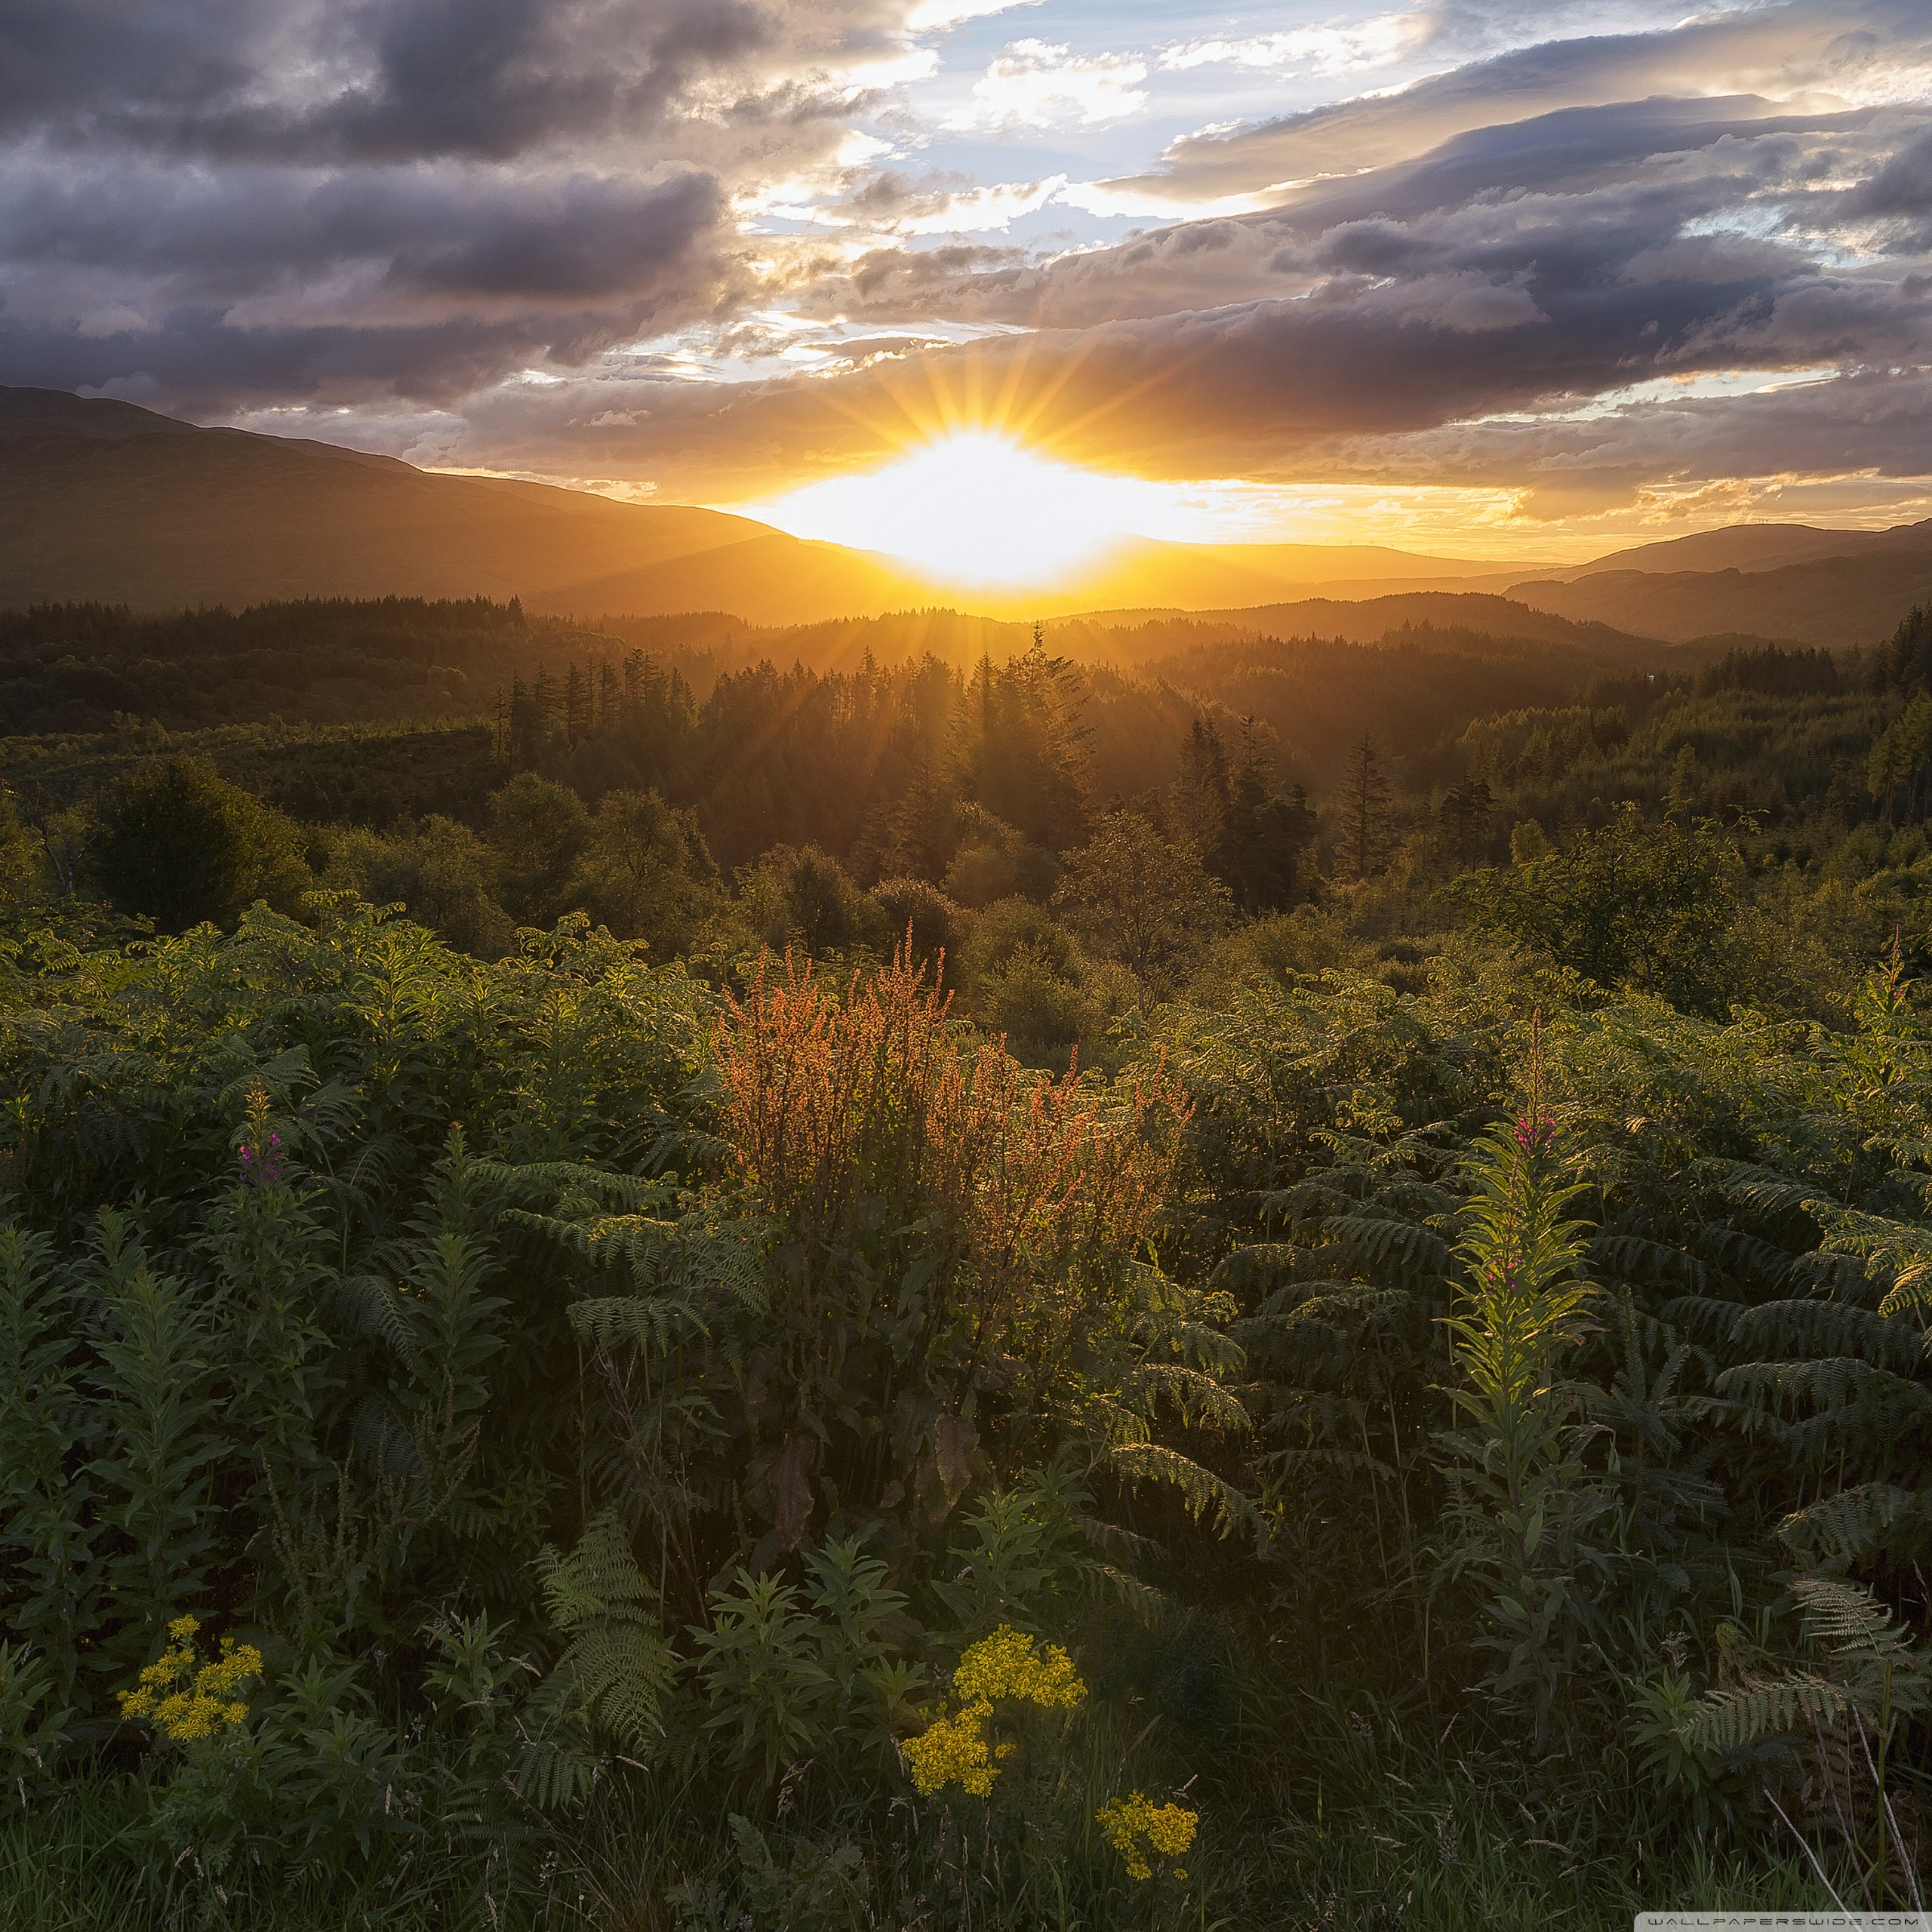 Hd Wallpaper Of Nature: Forest Scotland Nature HD Background Wallpaperscraft